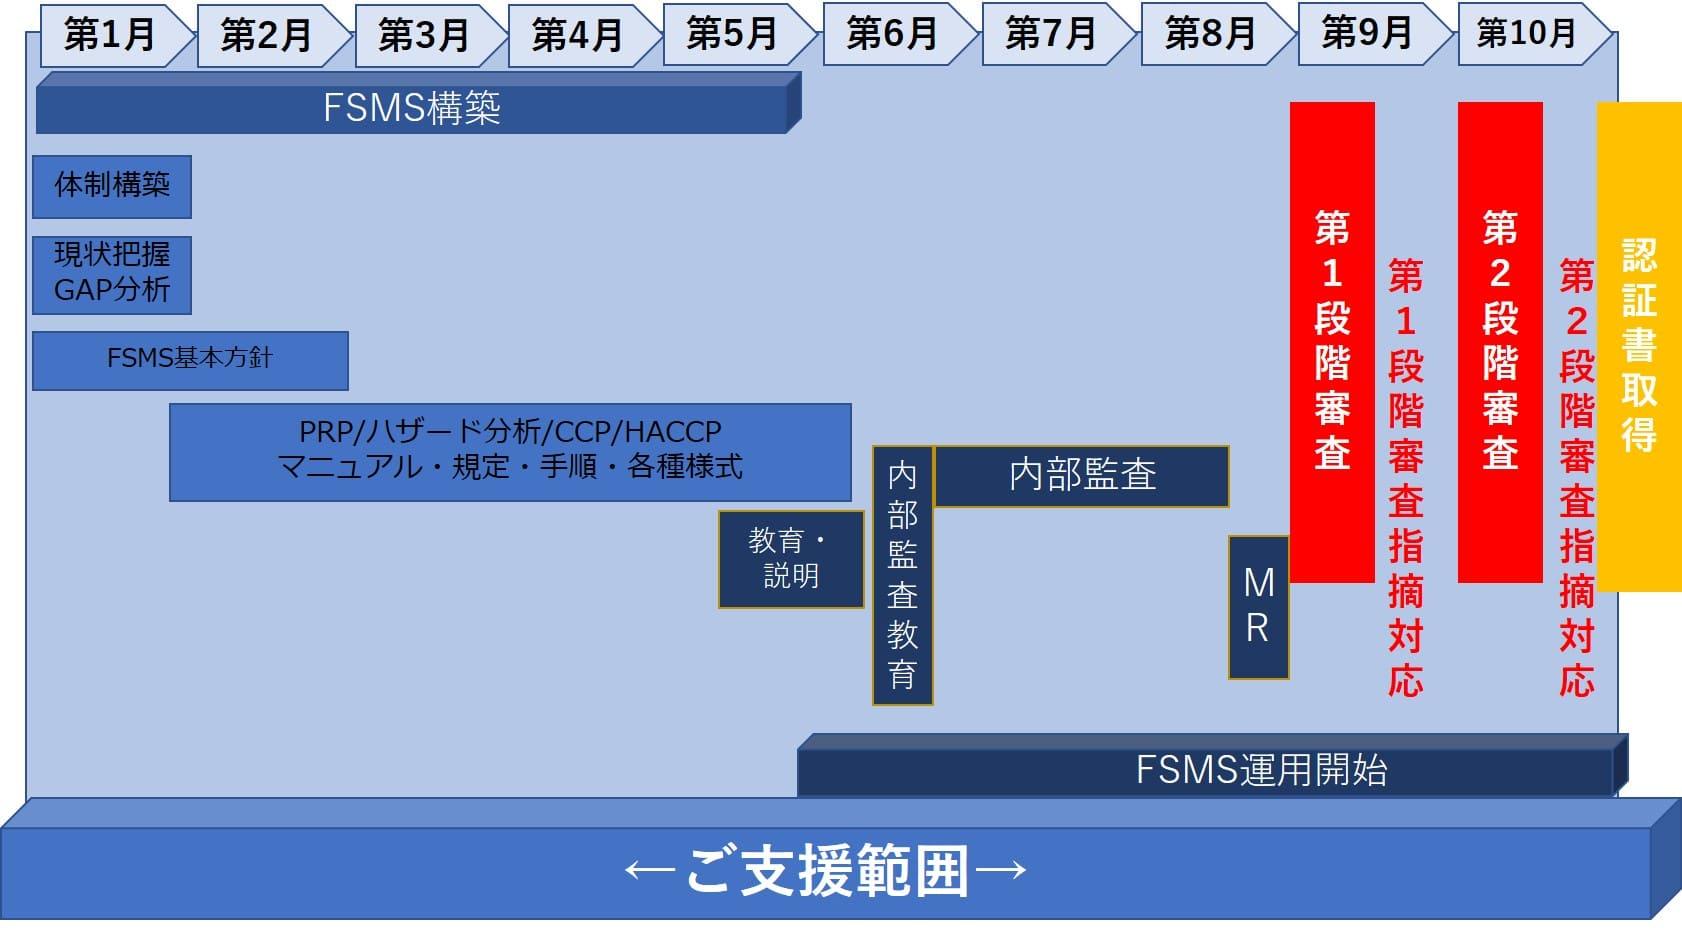 FSMS認証スケジュール